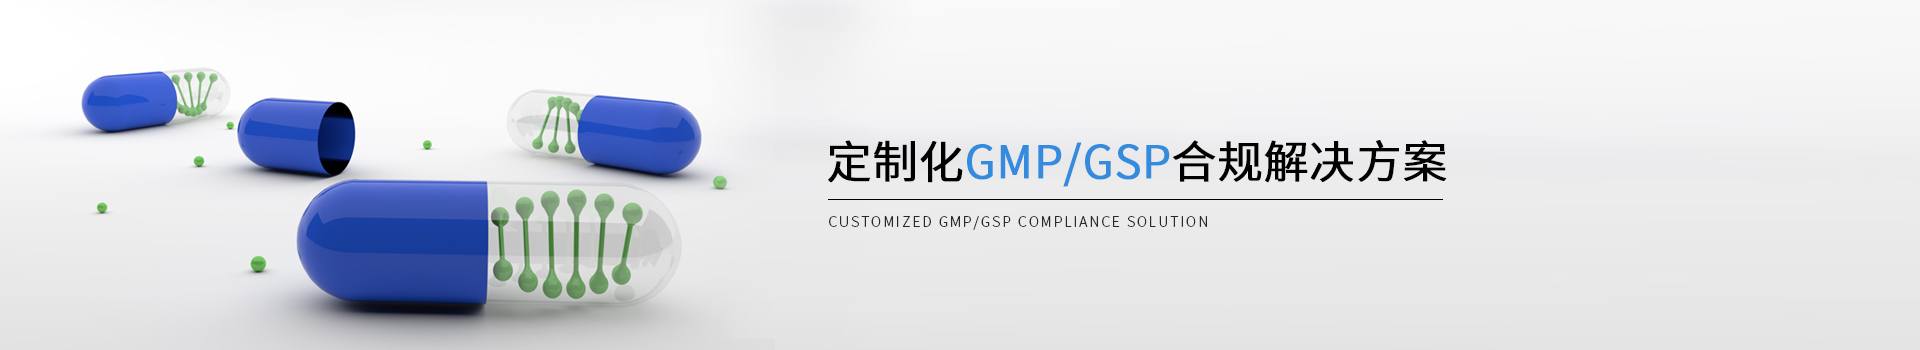 GMP培训-定制化GMP/GSP合规解决方案